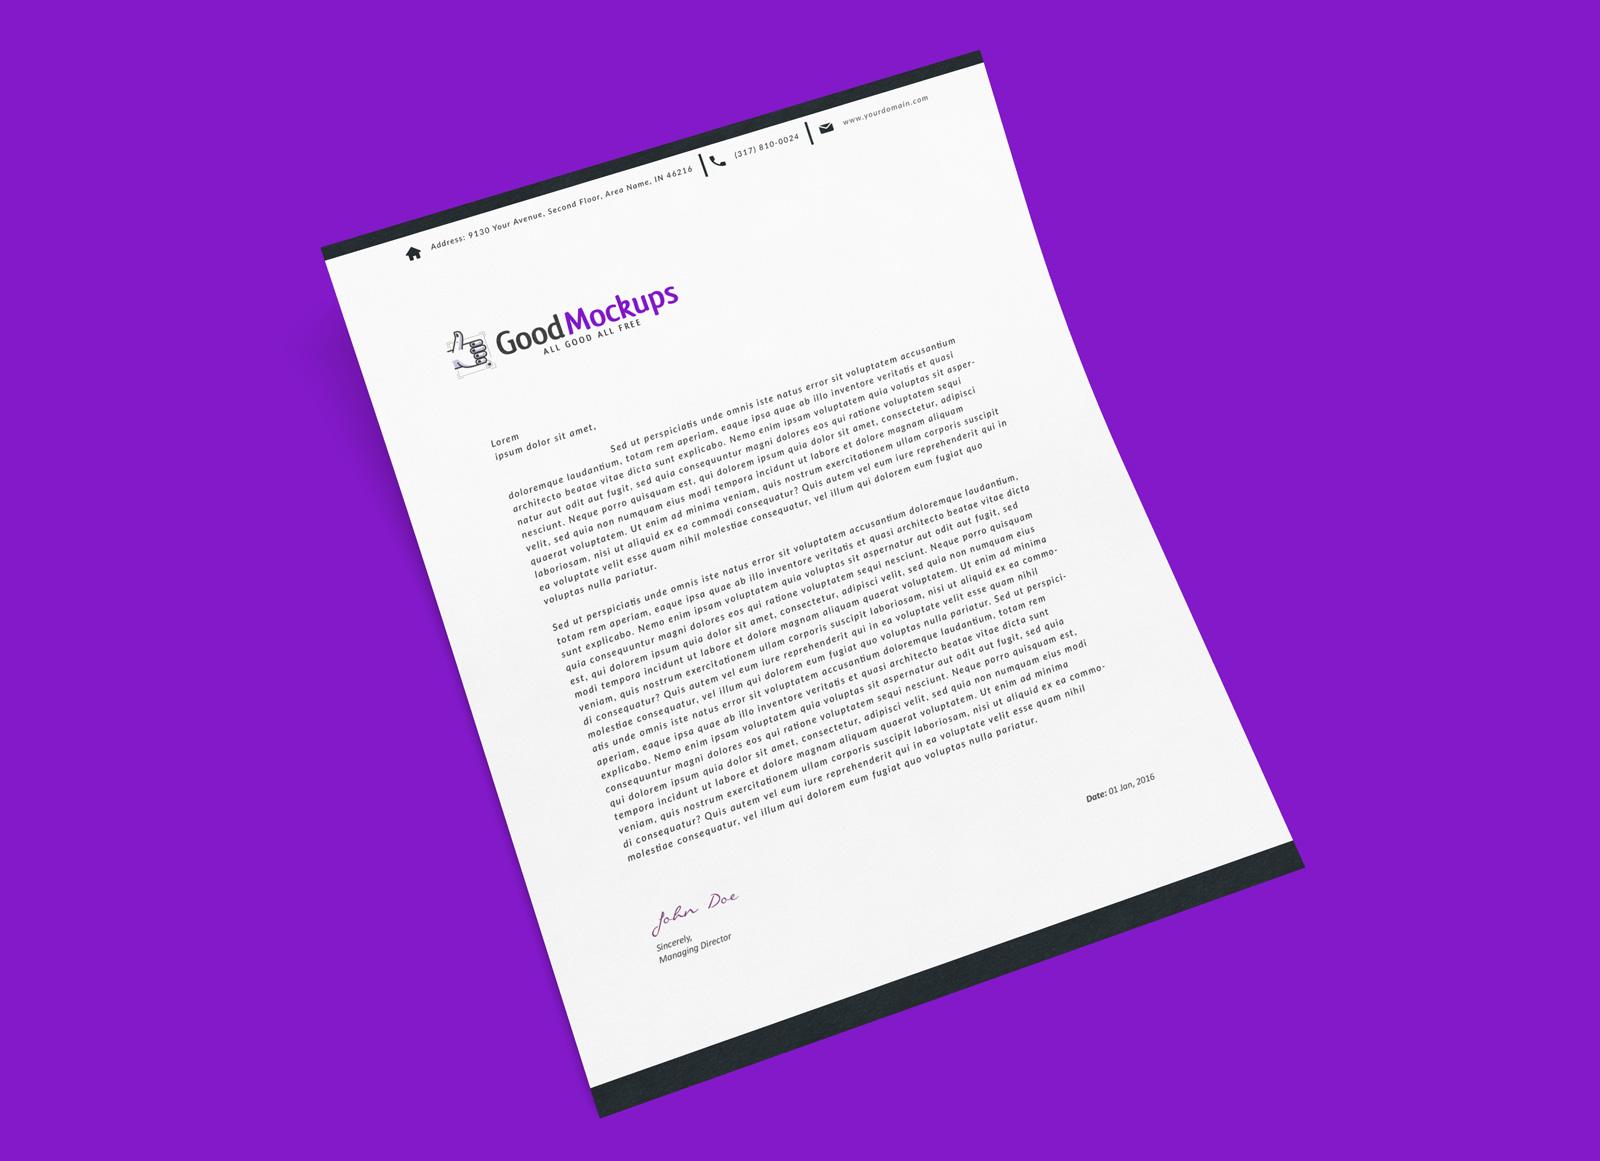 Free-A4-Letter-Size-Letterhead-Mockup-PSD-2